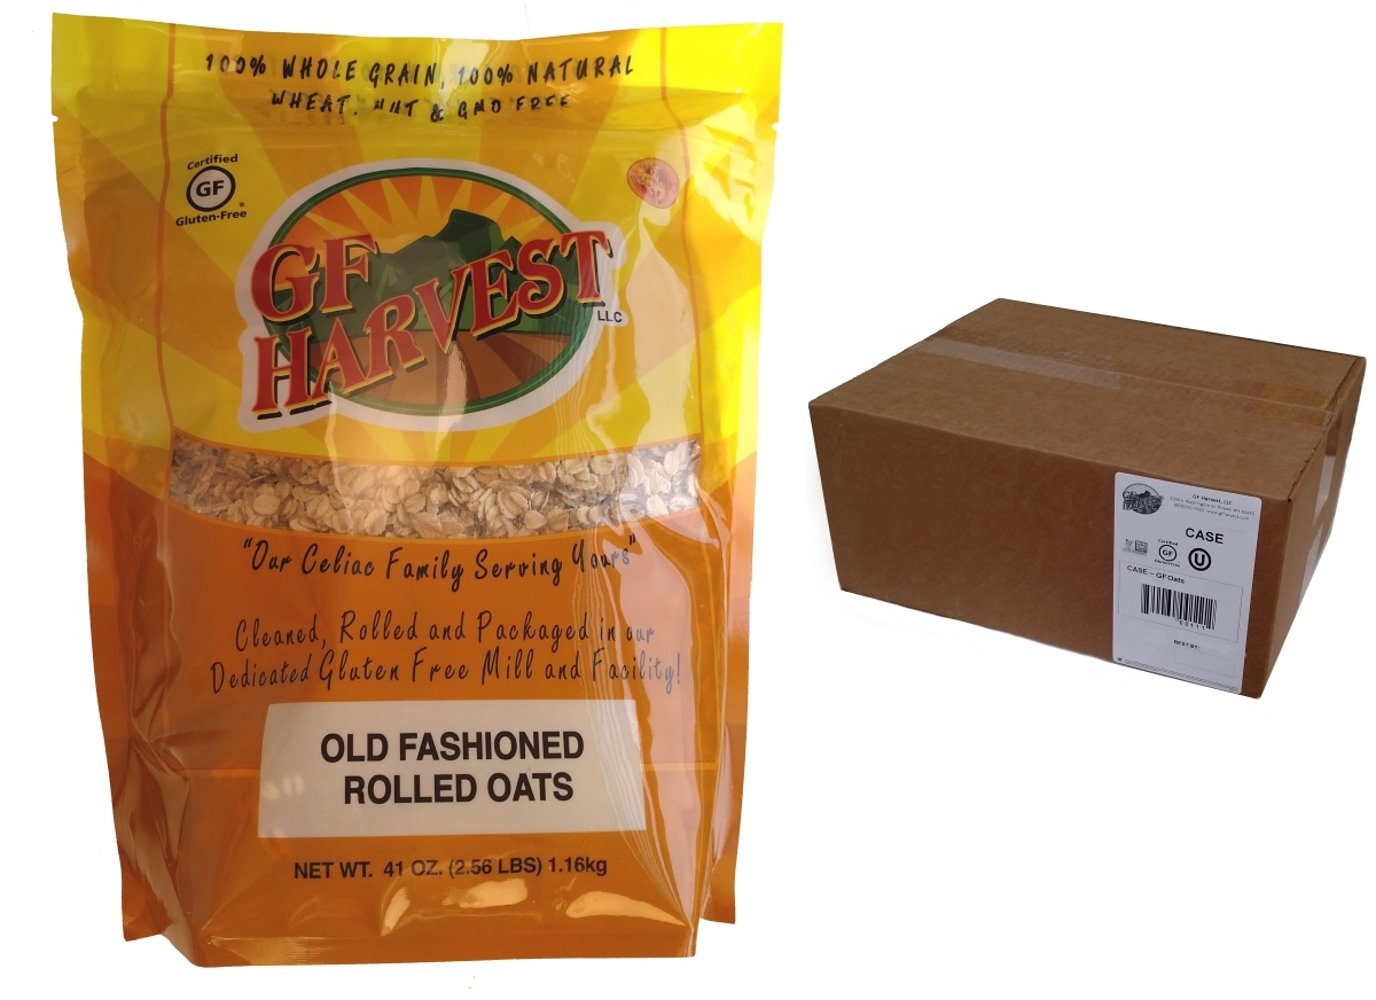 GF Harvest Gluten Free PureOats Rolled Oats, 41 oz. Bag, 6 Count by GF Harvest